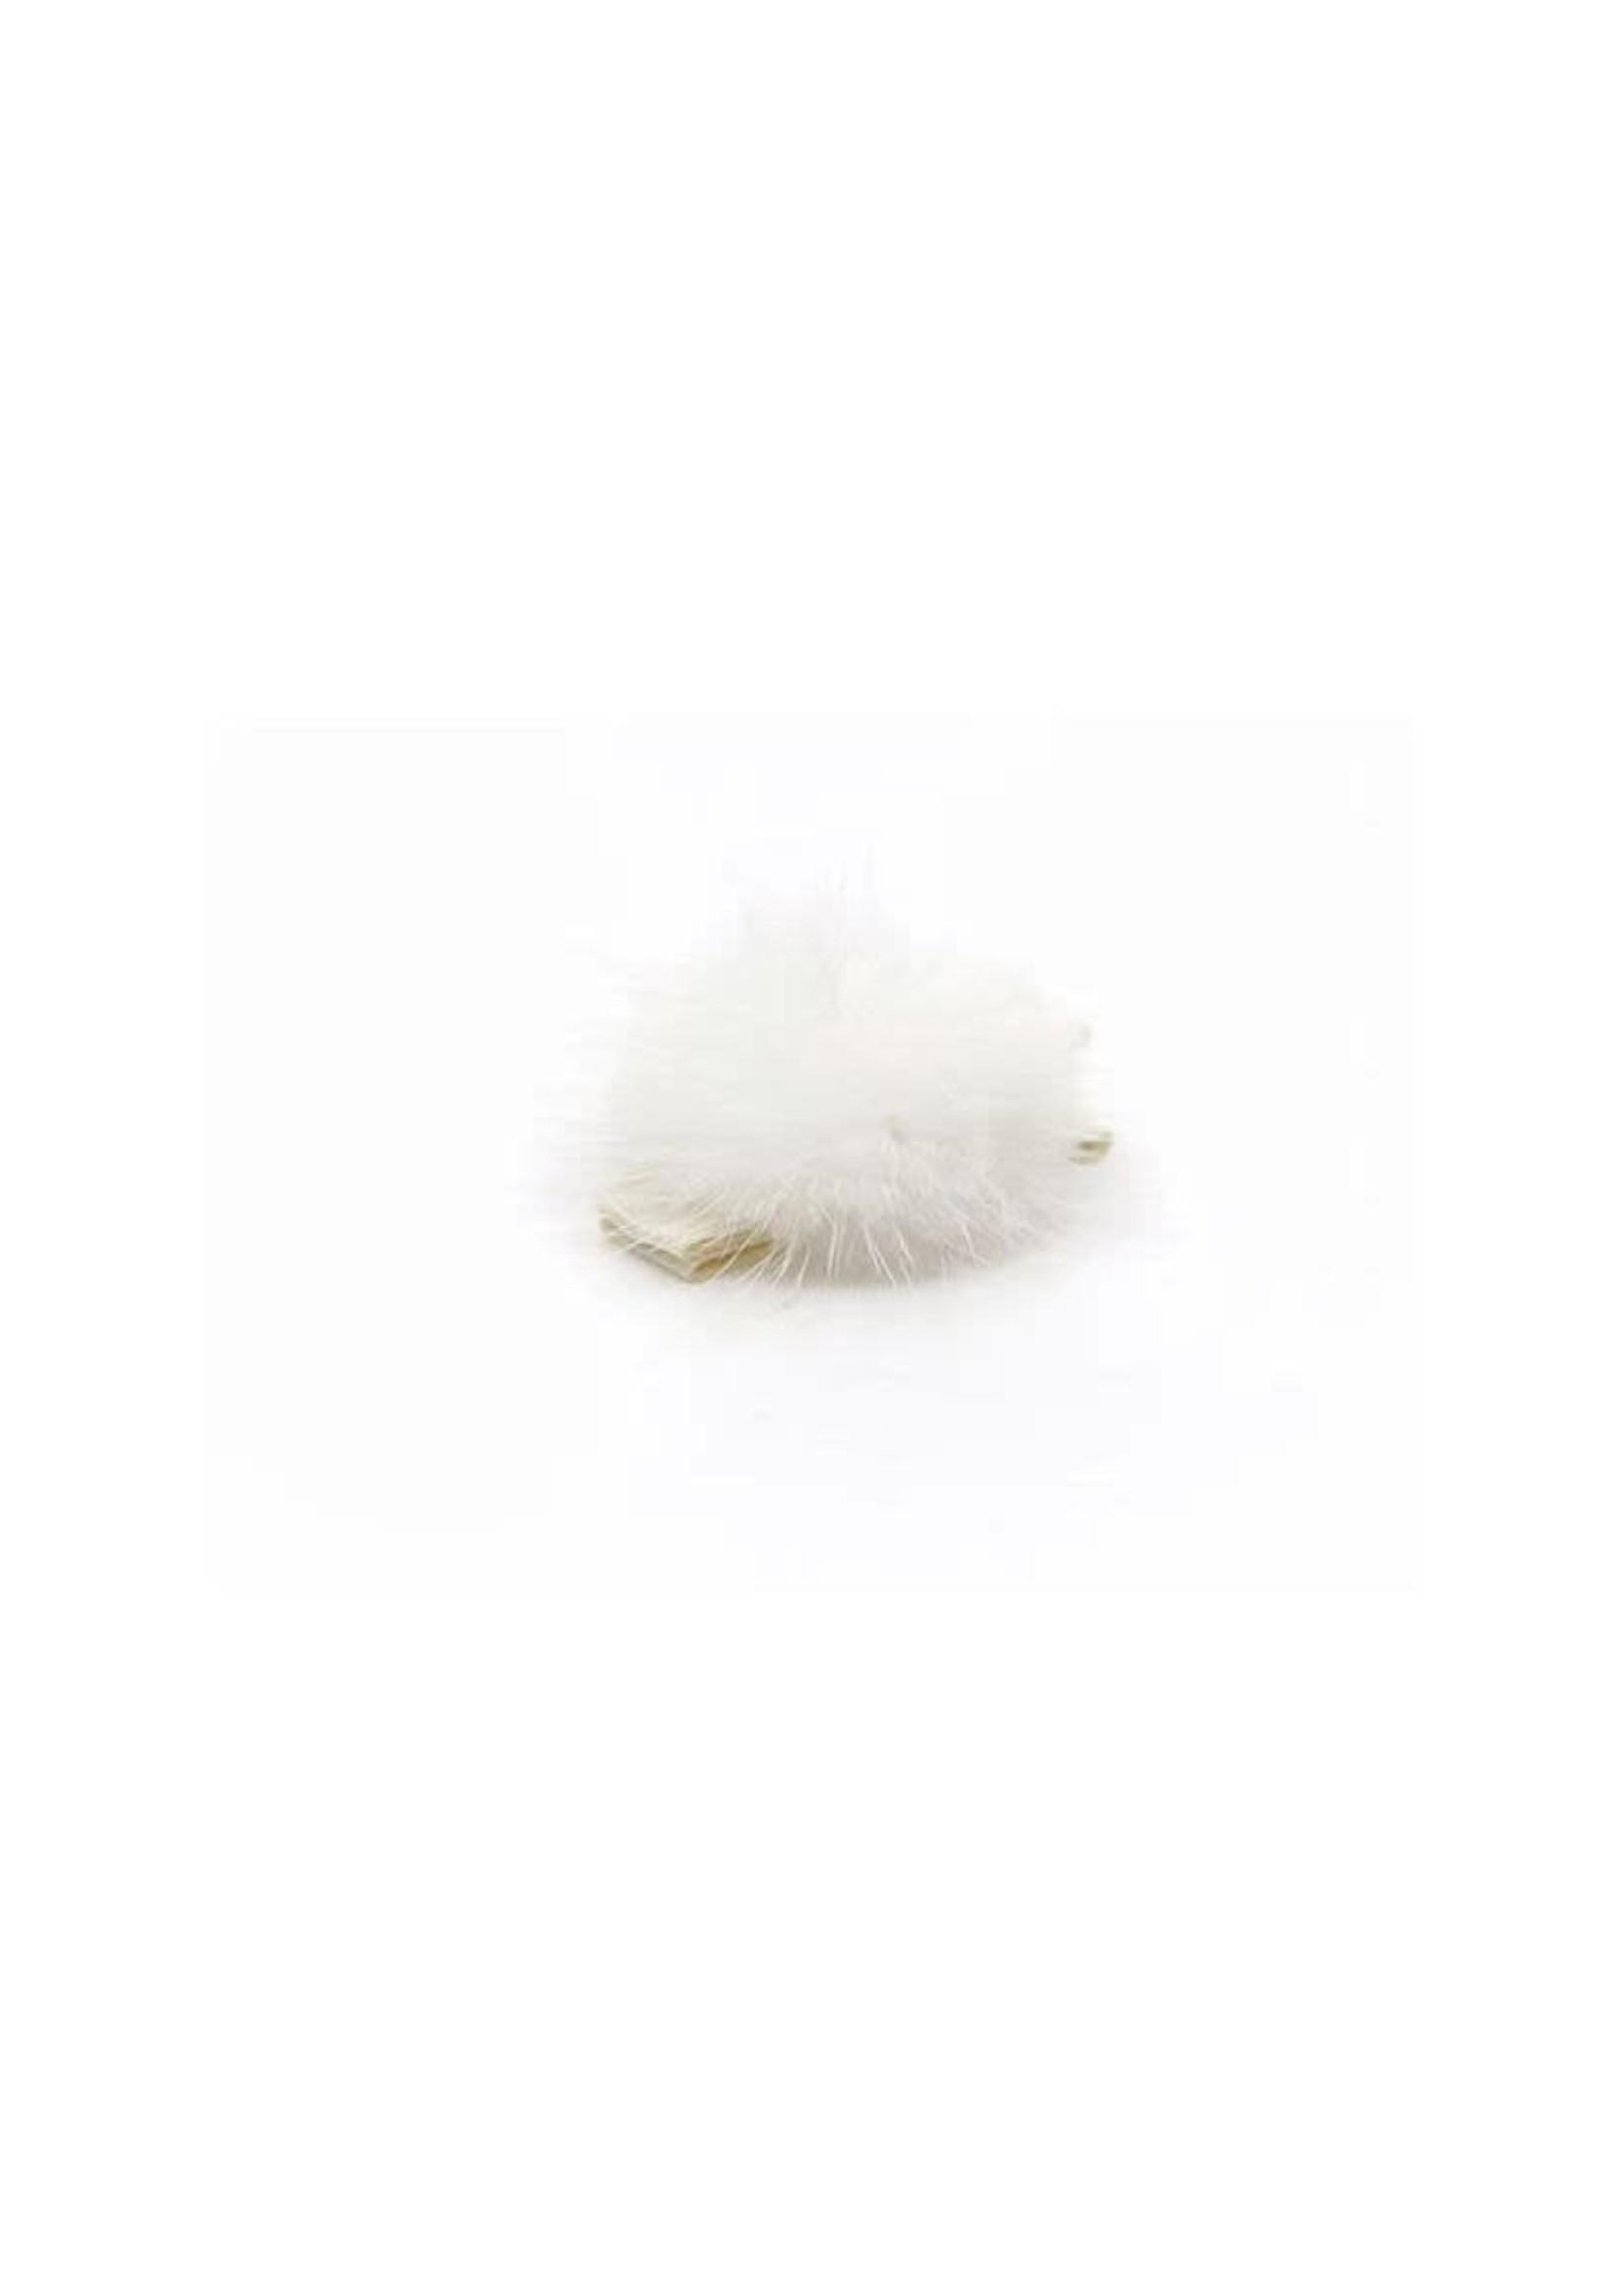 Olilia Small Mink Puff Hair Clip - Ivory